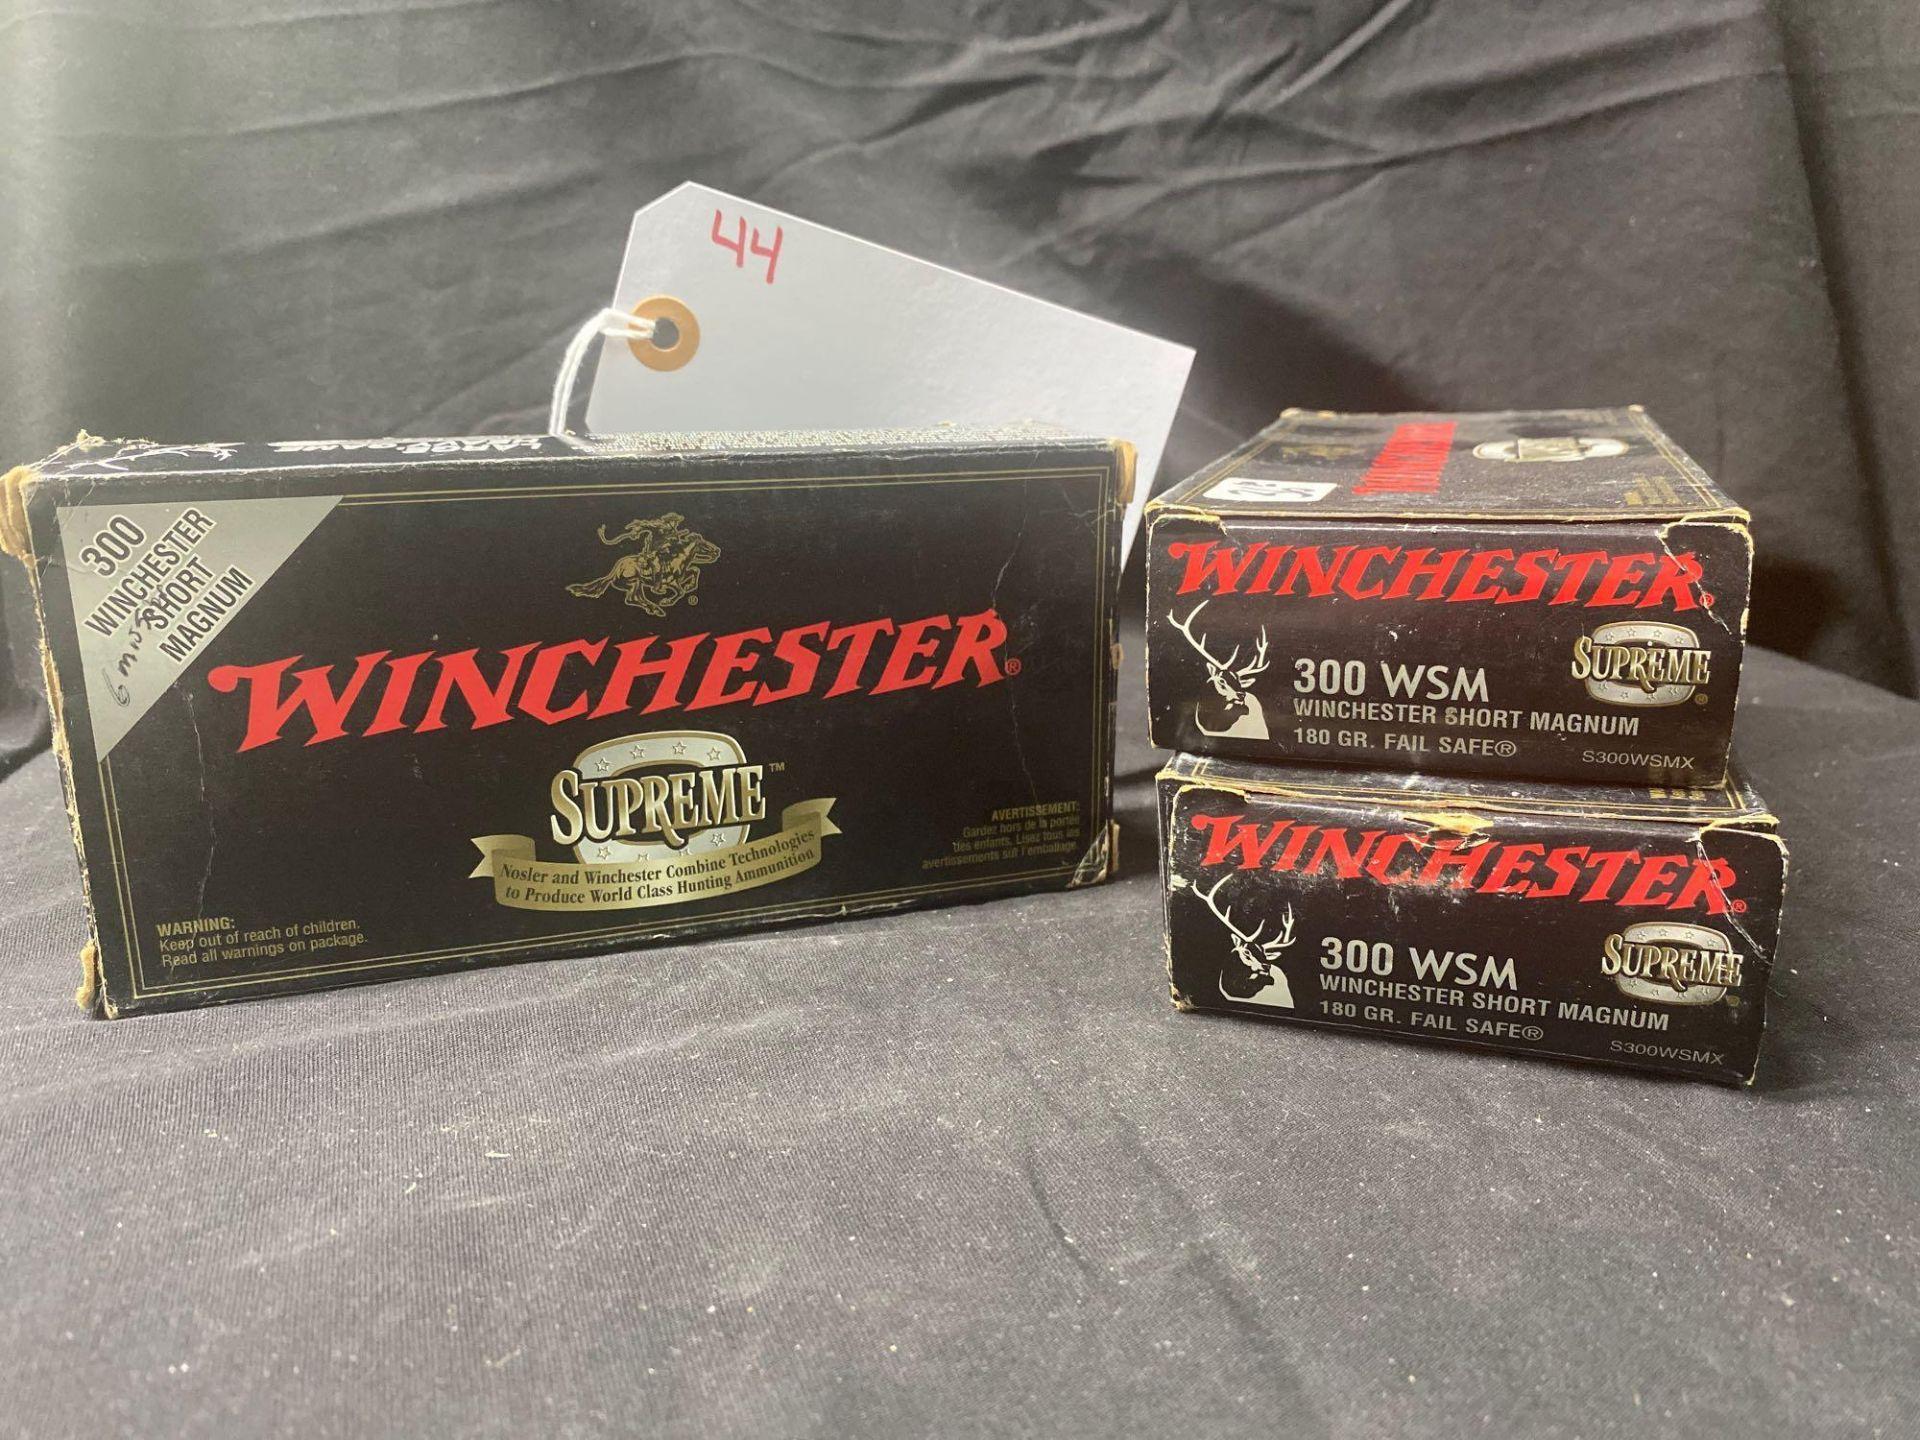 WINCHESTER SUPEREME, 300 WSM SHORT MAG (X3)